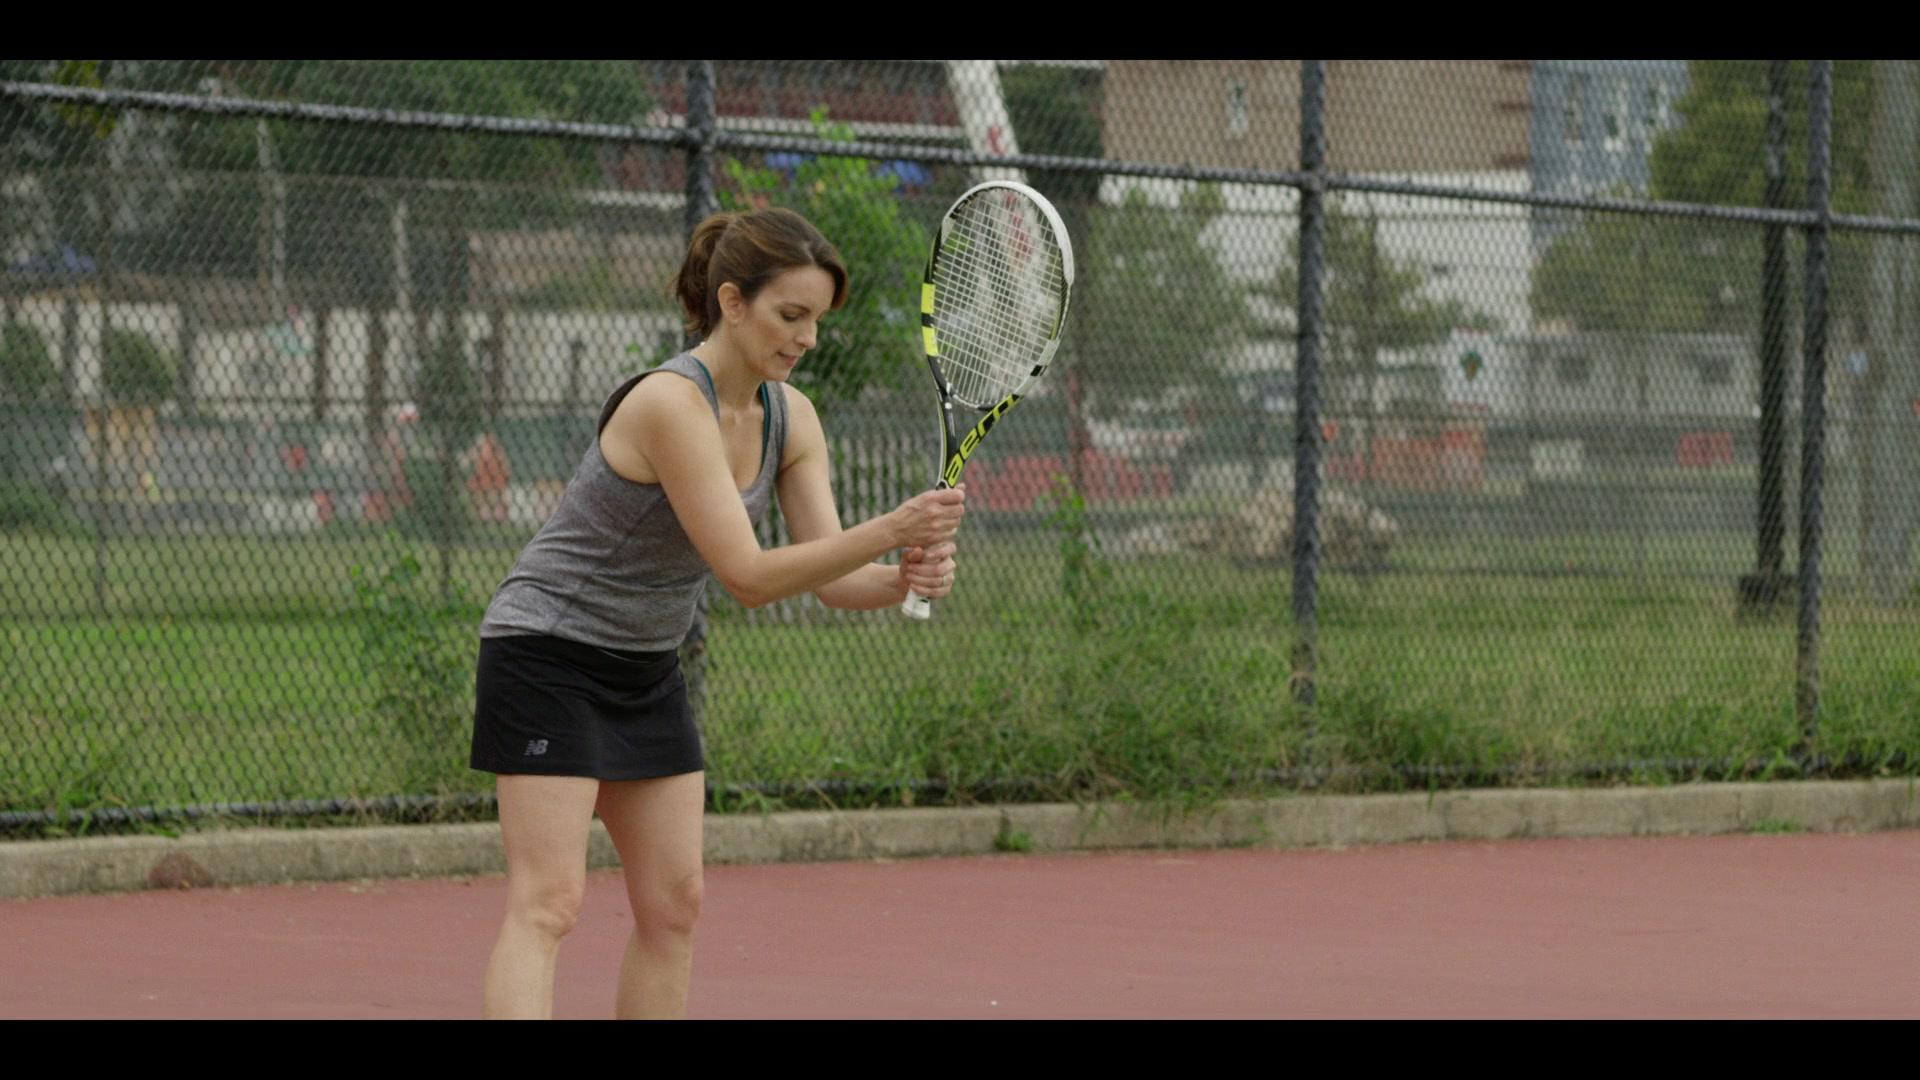 Babolat Aero Tennis Racquet Used by Tina Fey as Sarah in